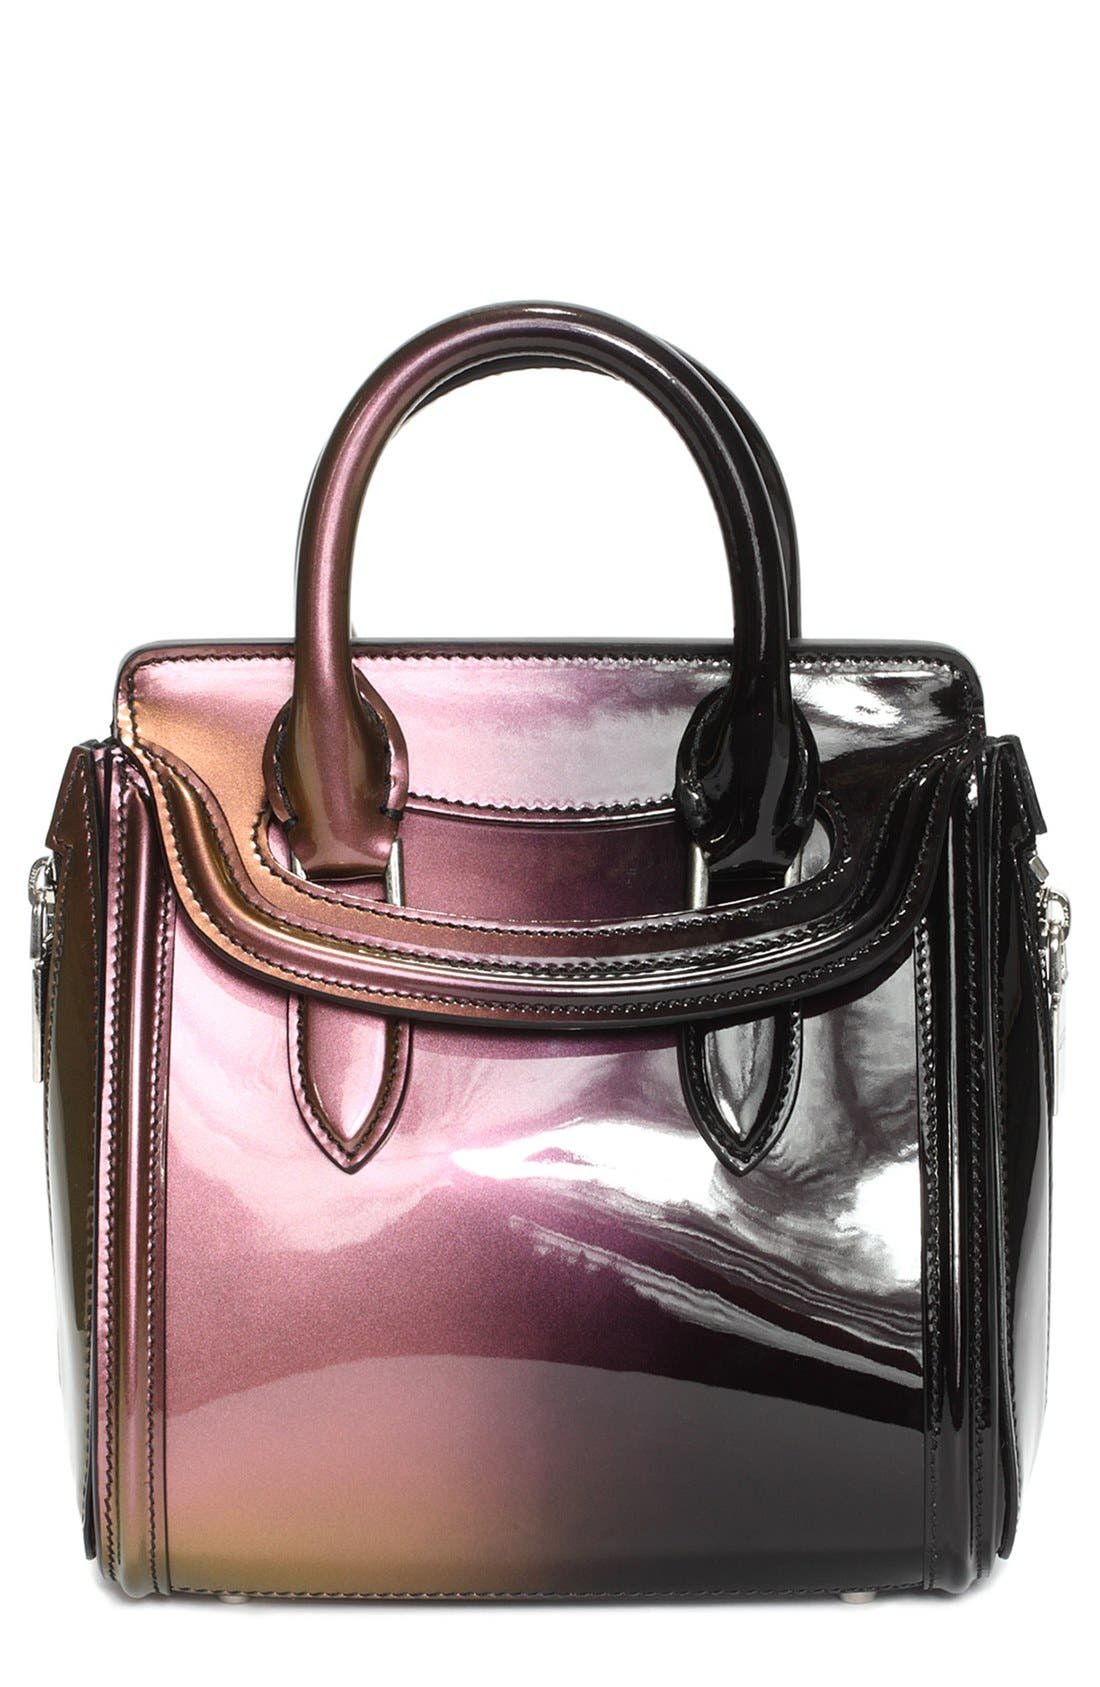 Main Image - Alexander McQueen 'Mini Heroine' Patent Leather Satchel